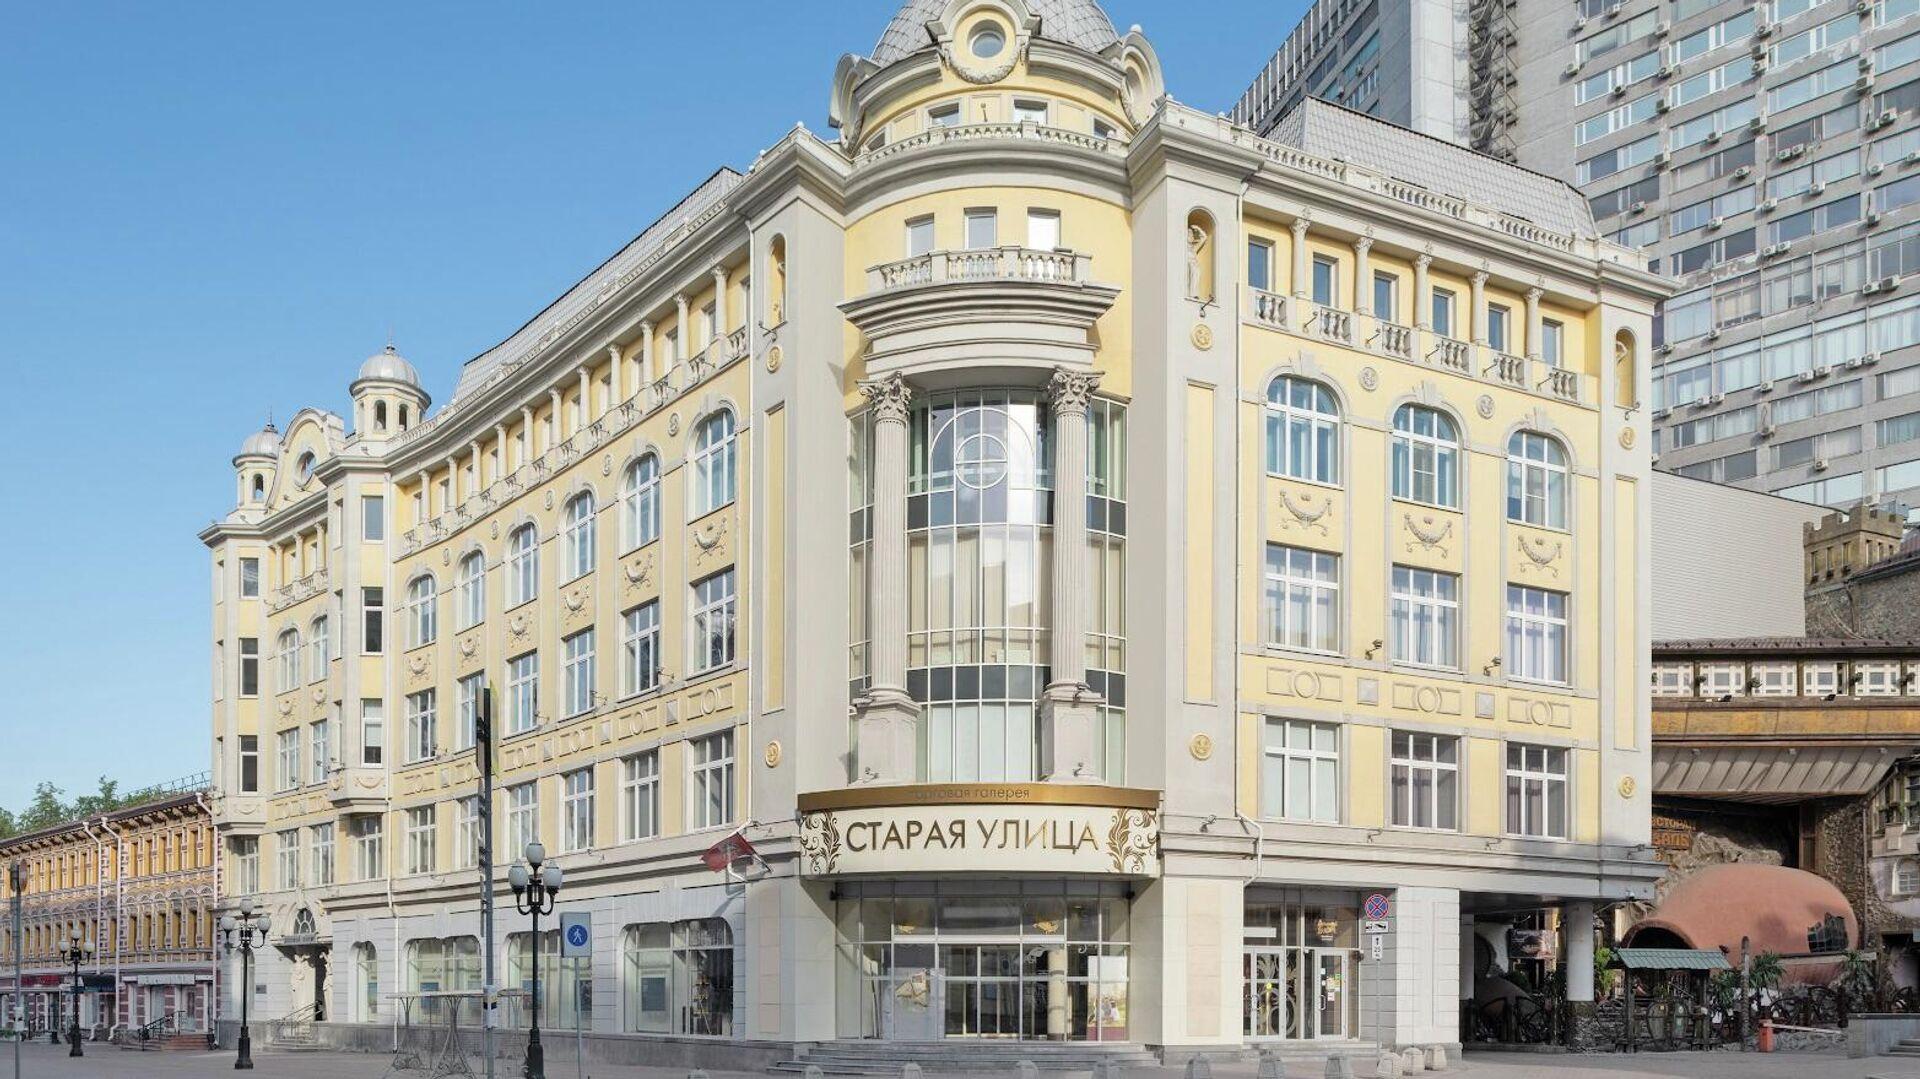 Бизнес-центр Midland Plaza на Арбате в Москве - РИА Новости, 1920, 16.09.2020